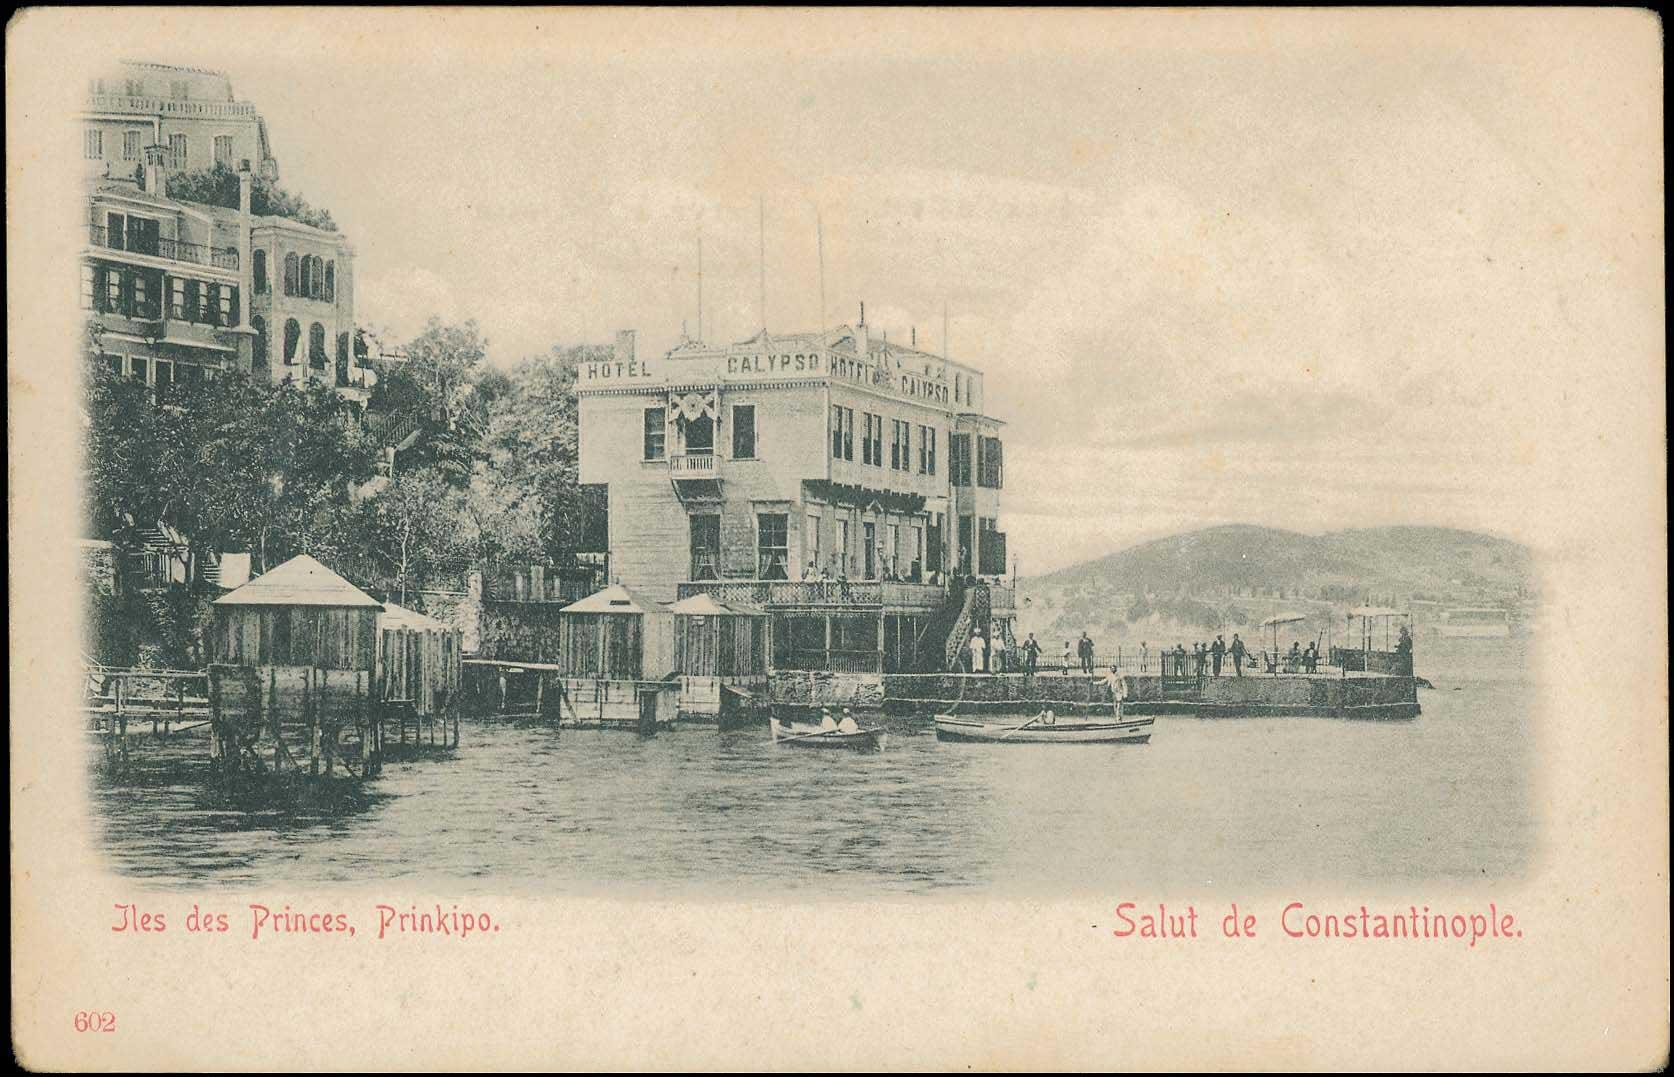 Lot 1765 - -  PICTURE POSTCARDS SMYRNE, CONSTANTINOPLE, ASIA MINOR -  A. Karamitsos Public & Live Internet Auction 675